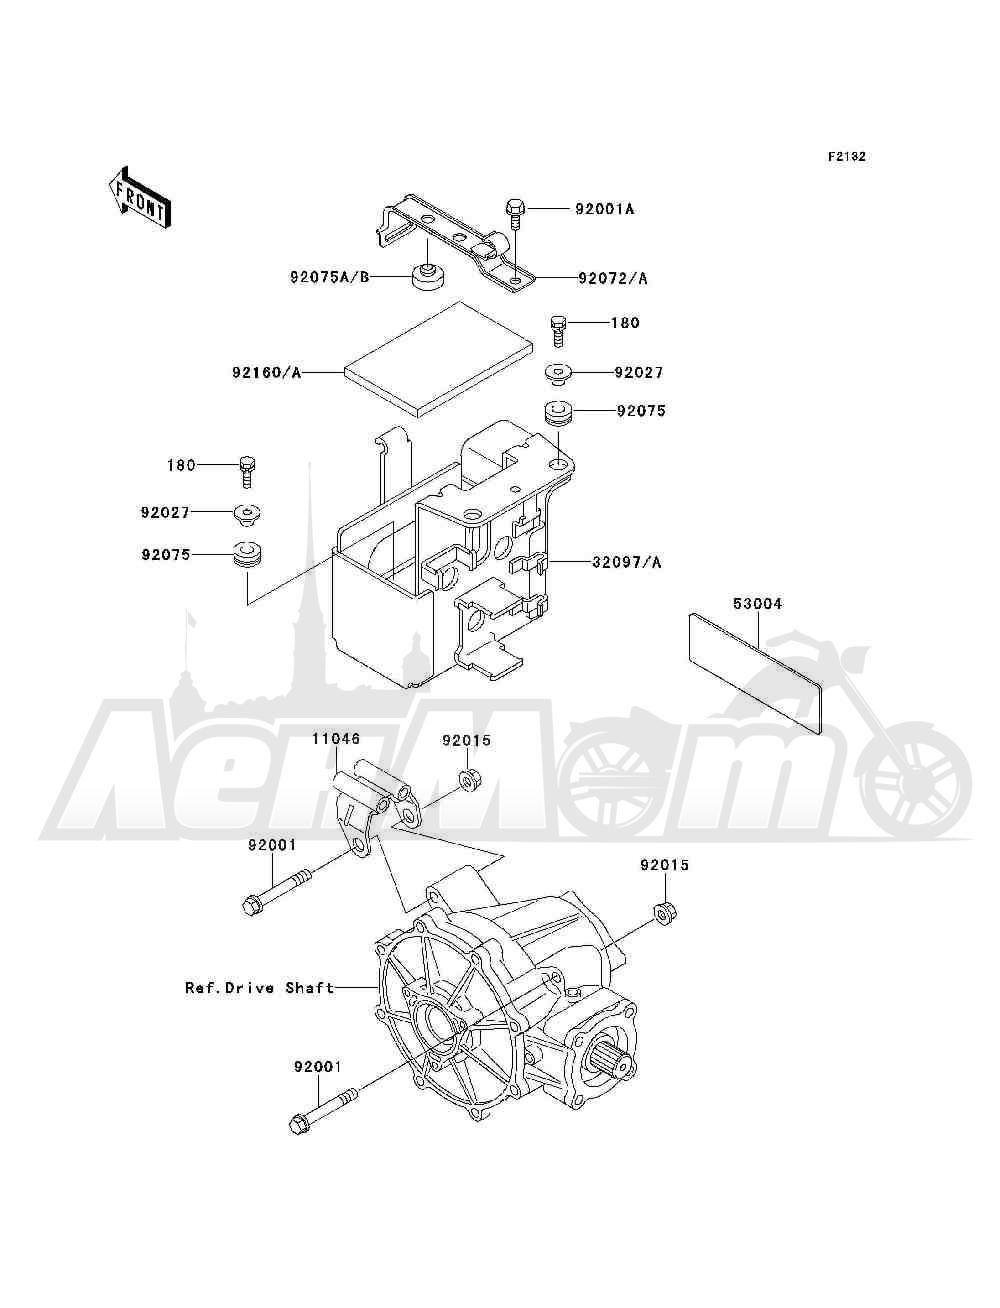 Запчасти для Квадроцикла Kawasaki 1993 BAYOU 300 4X4 (KLF300-C5) Раздел: BATTERY CASE | аккумулятор корпус